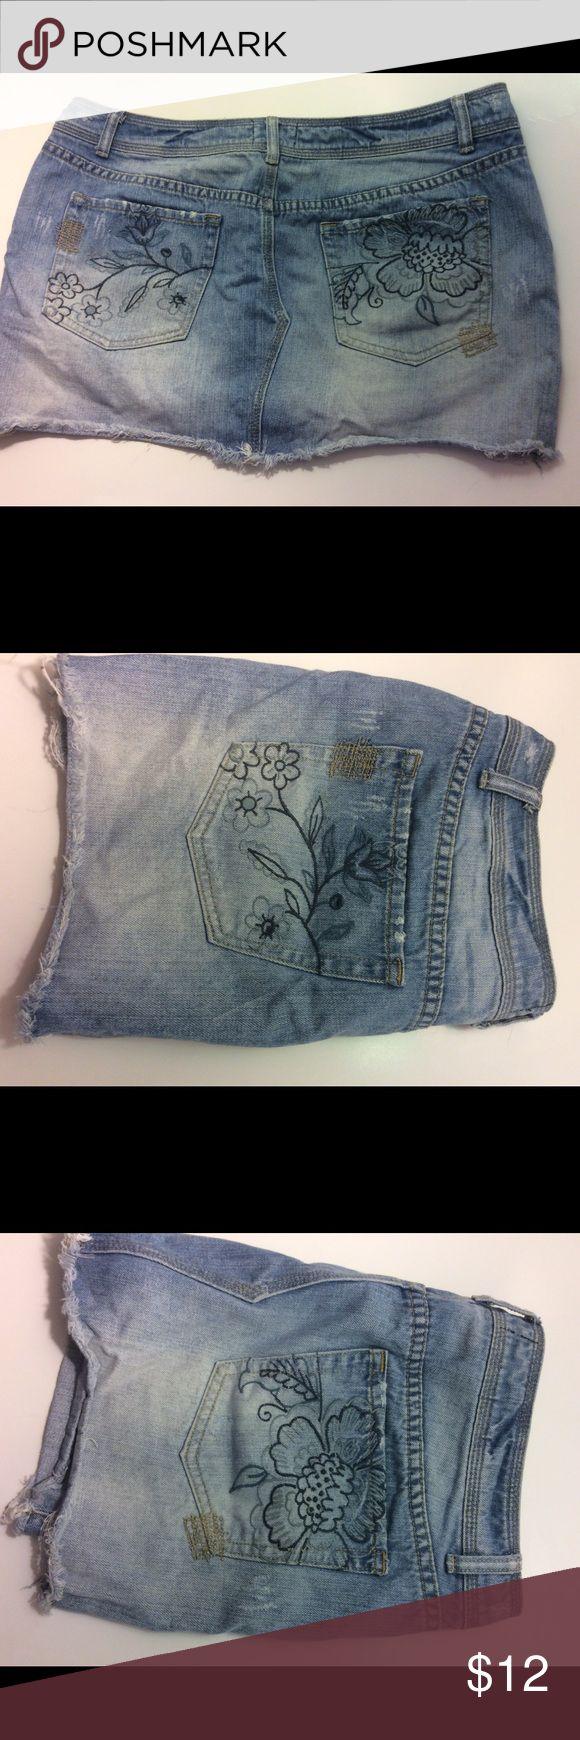 Spotted while shopping on Poshmark: 💙 Blue Jeans mini skirt 💙! #poshmark #fashion #shopping #style #Aeropostale #Dresses & Skirts